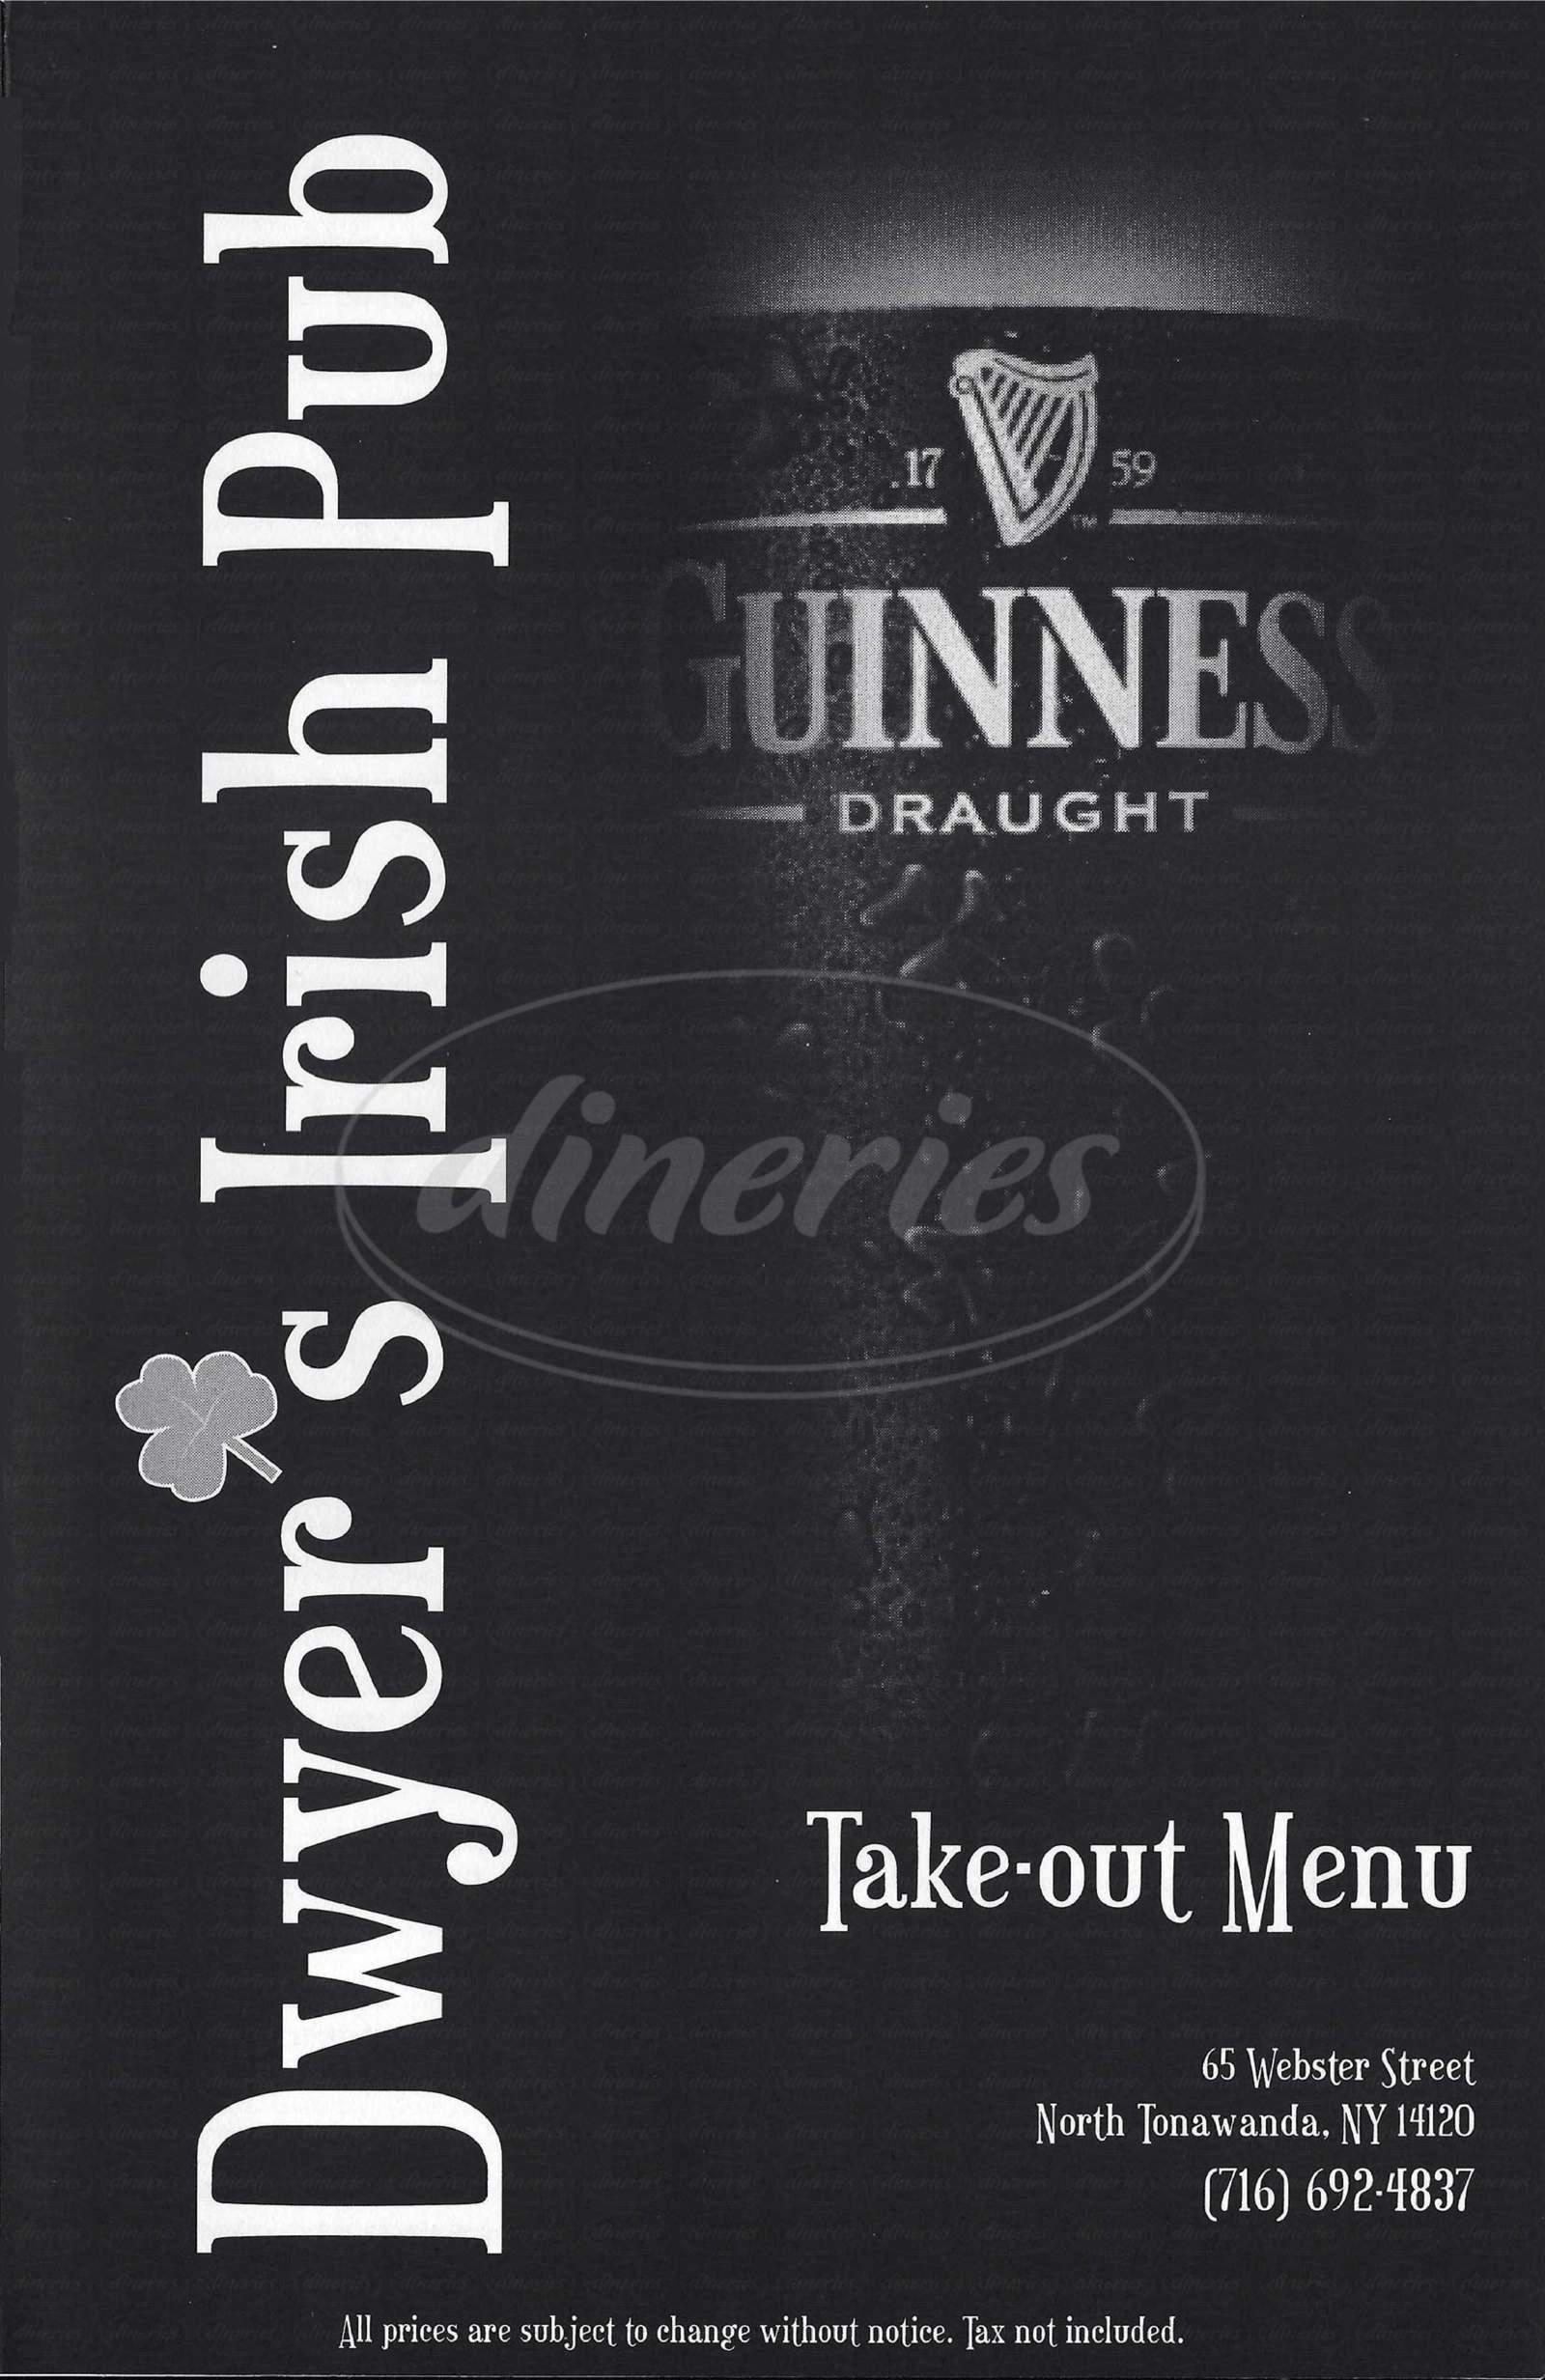 menu for JP Dwyers Pub